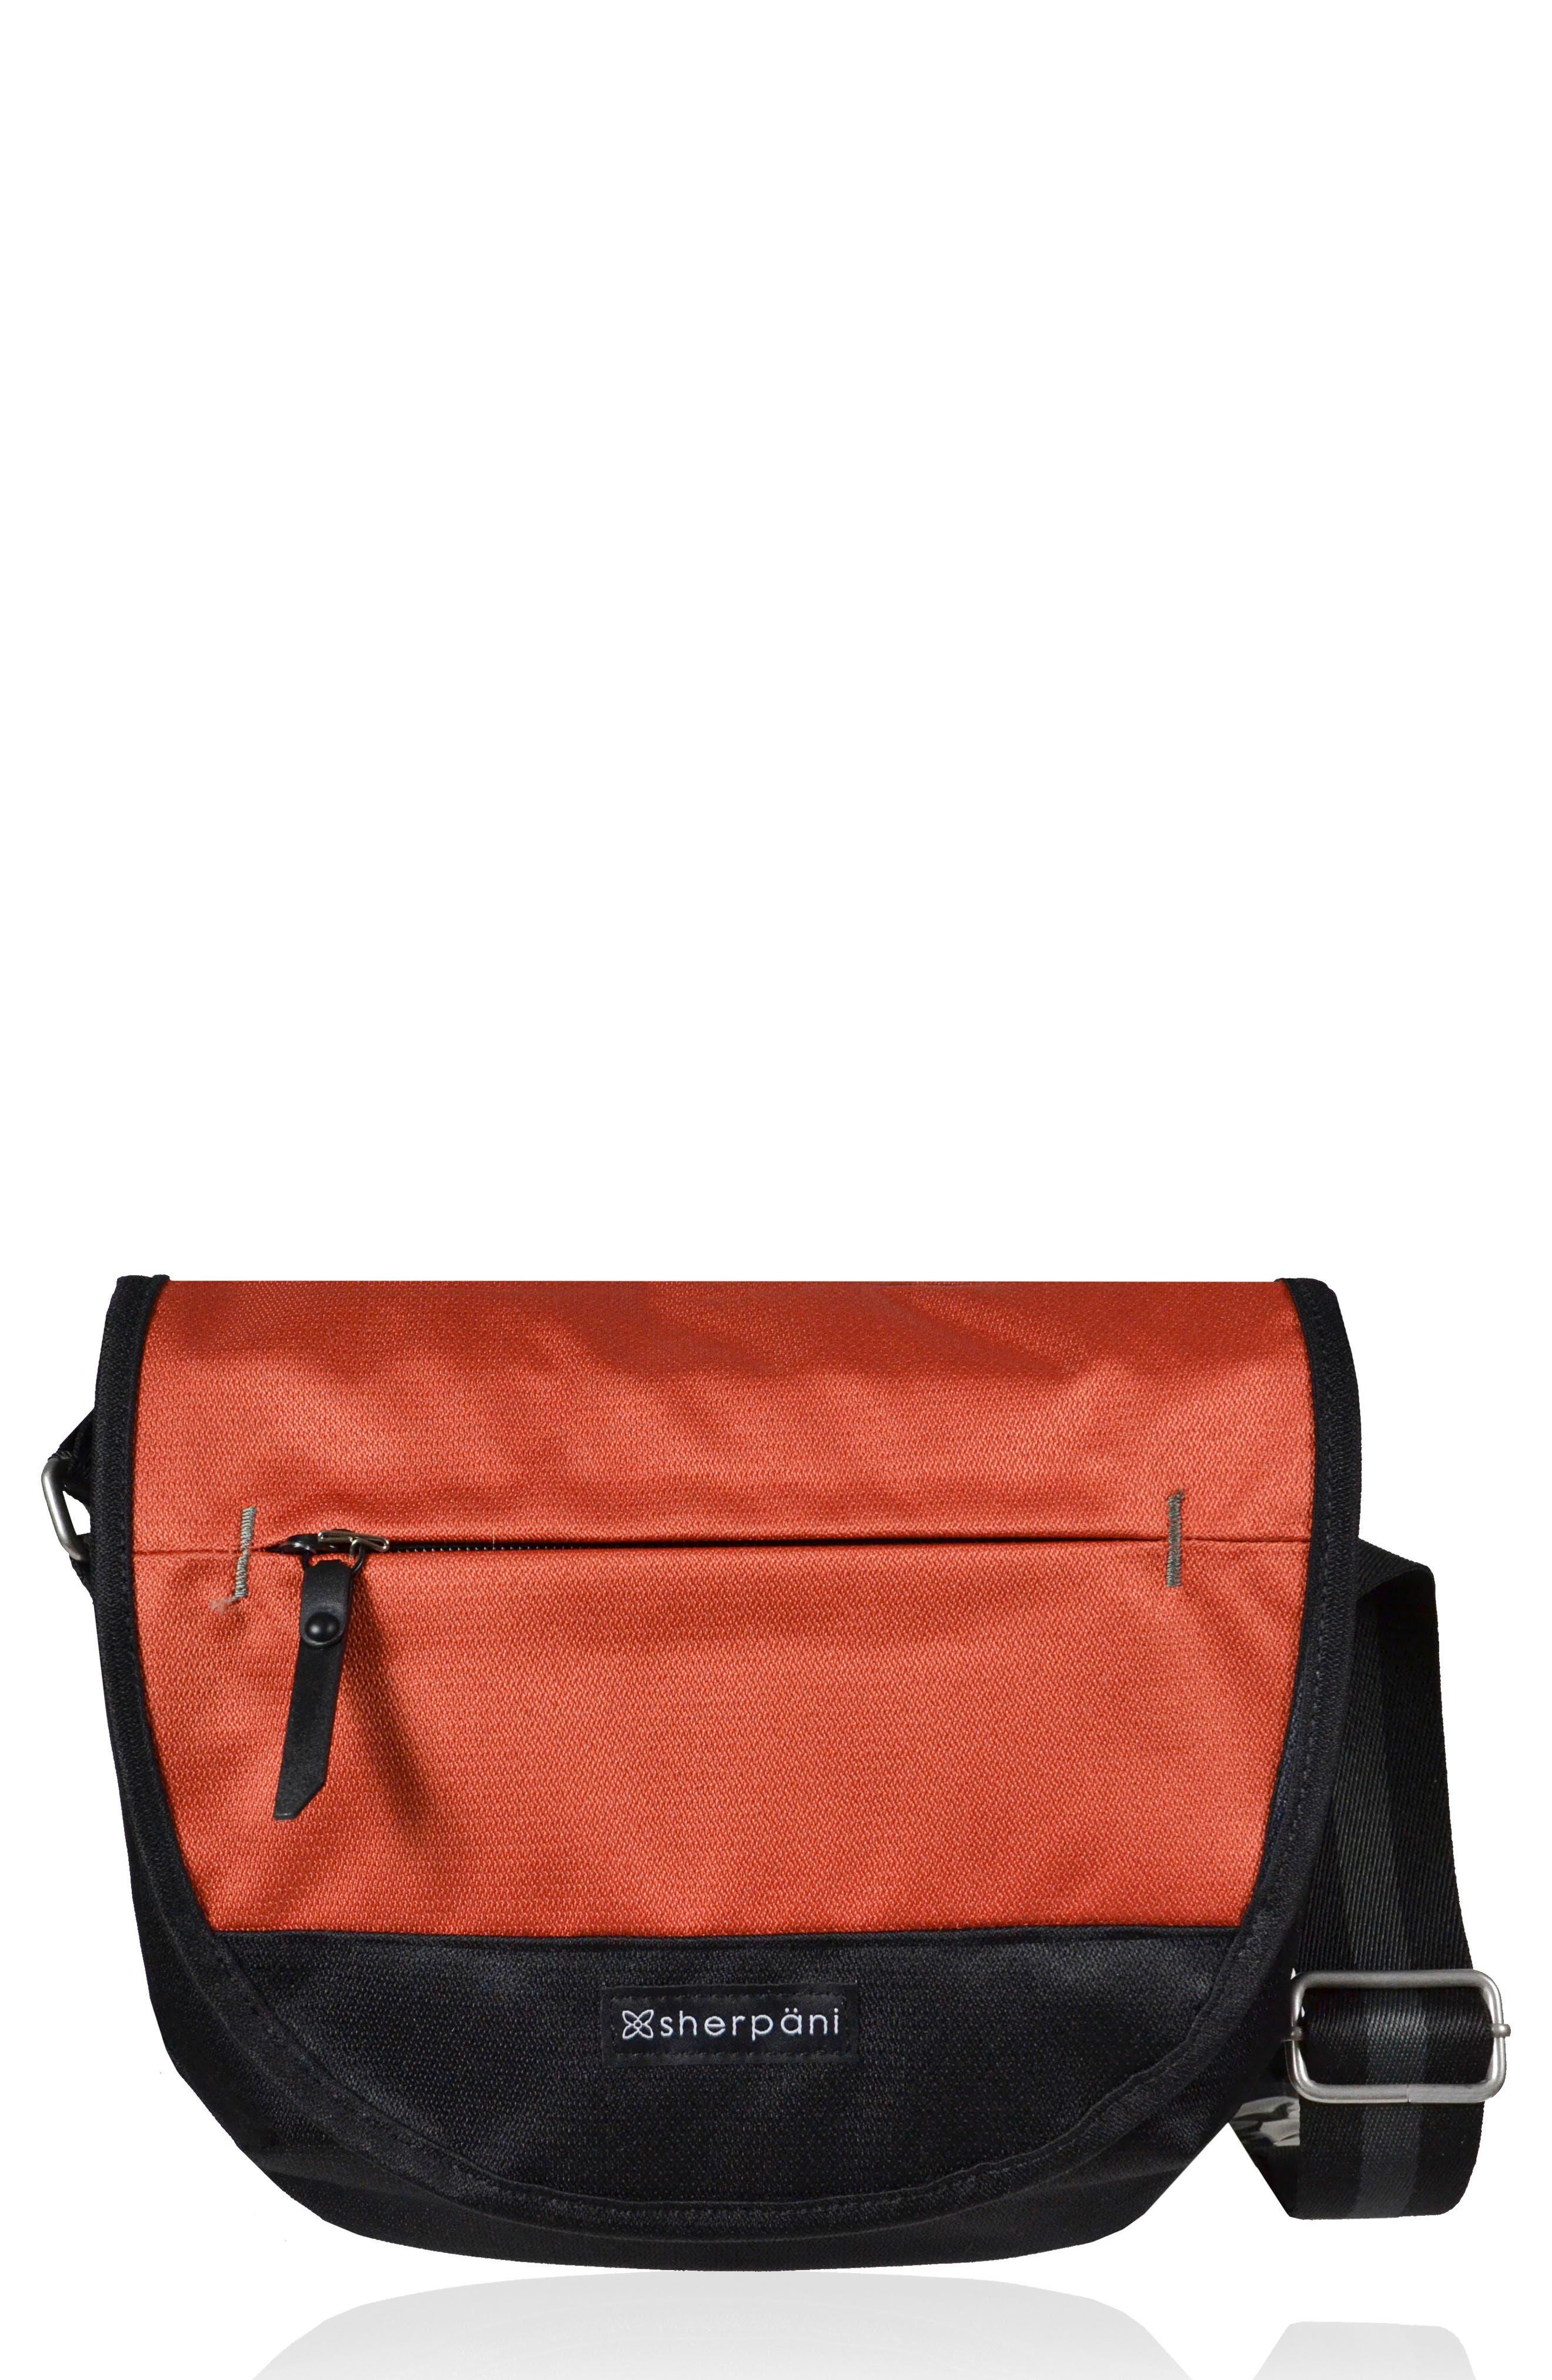 Alternate Image 1 Selected - Sherpani Milli Water Resistant RFID Pocket Messenger Bag